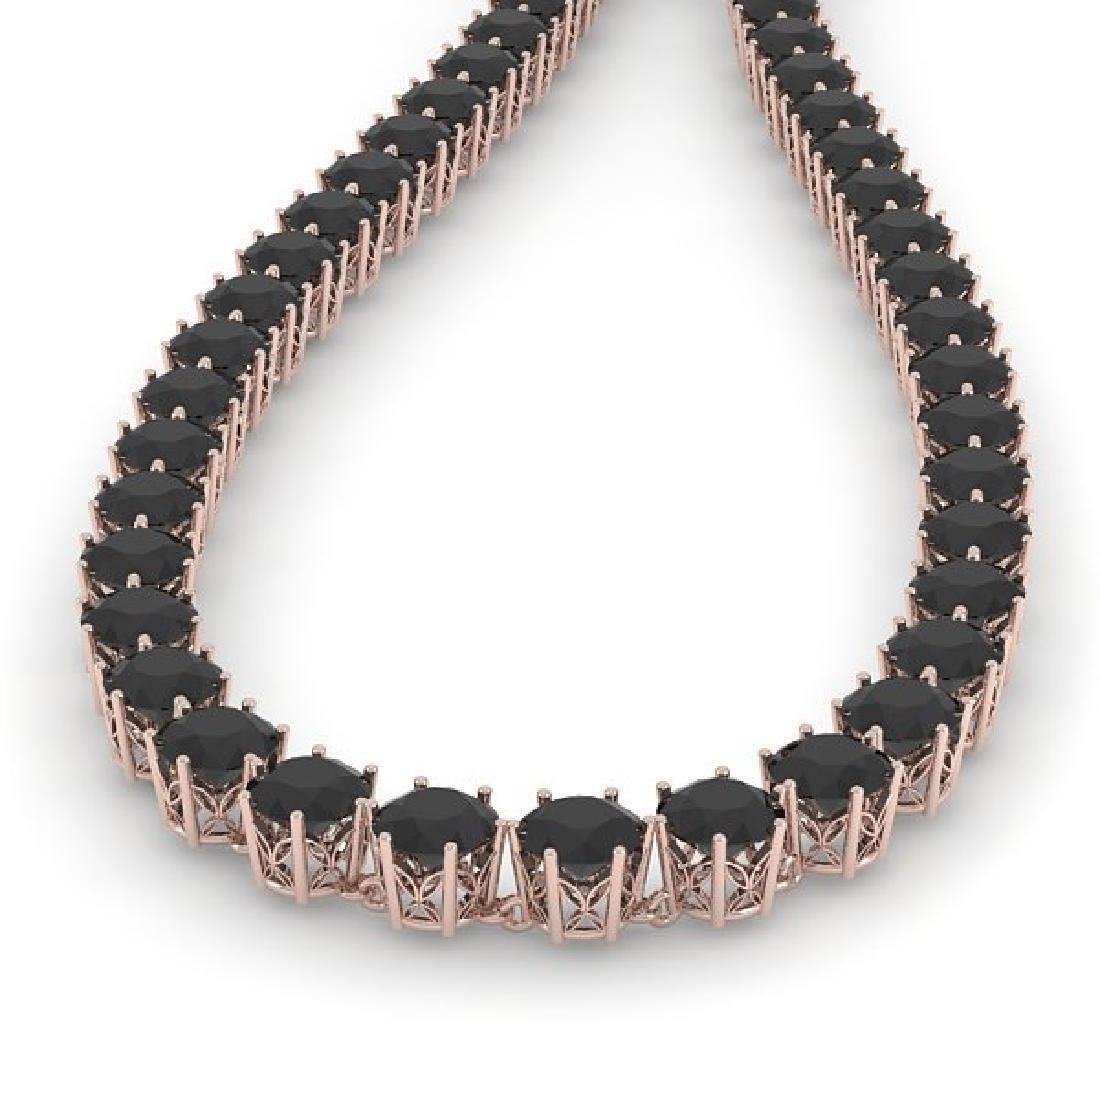 36 CTW Certified Black VS Diamond Necklace 14K Rose - 2